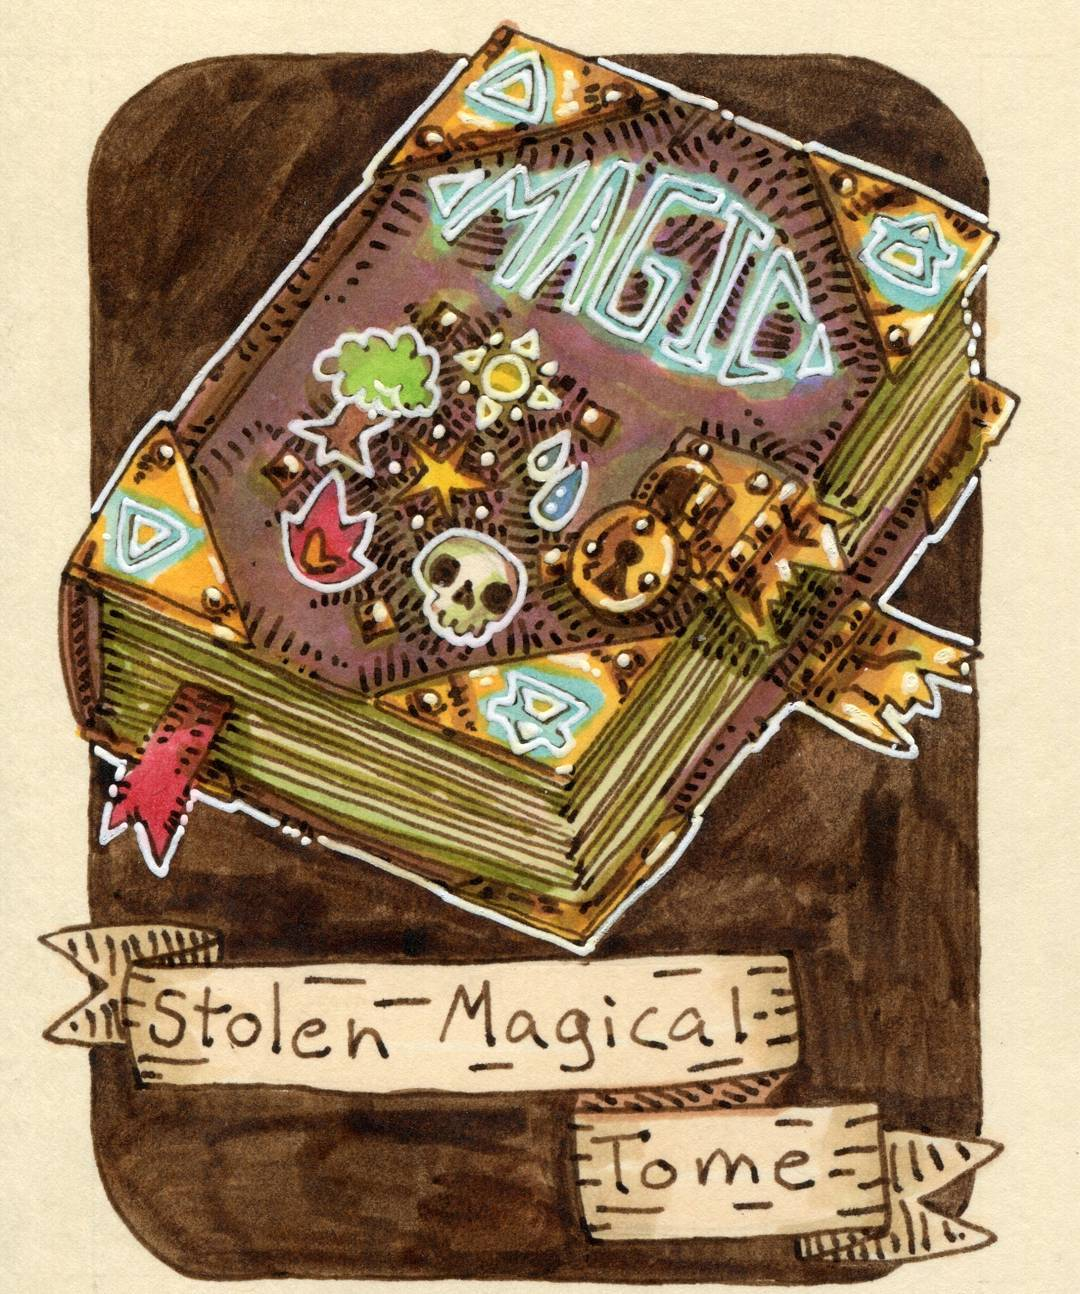 "redjarojam ""Stolen Magical Tome"" - by Jared DeCosta (redjarojam) www.instagram.com/redjarojam (2018-02) © dell'autore tutti i diritti riservati"